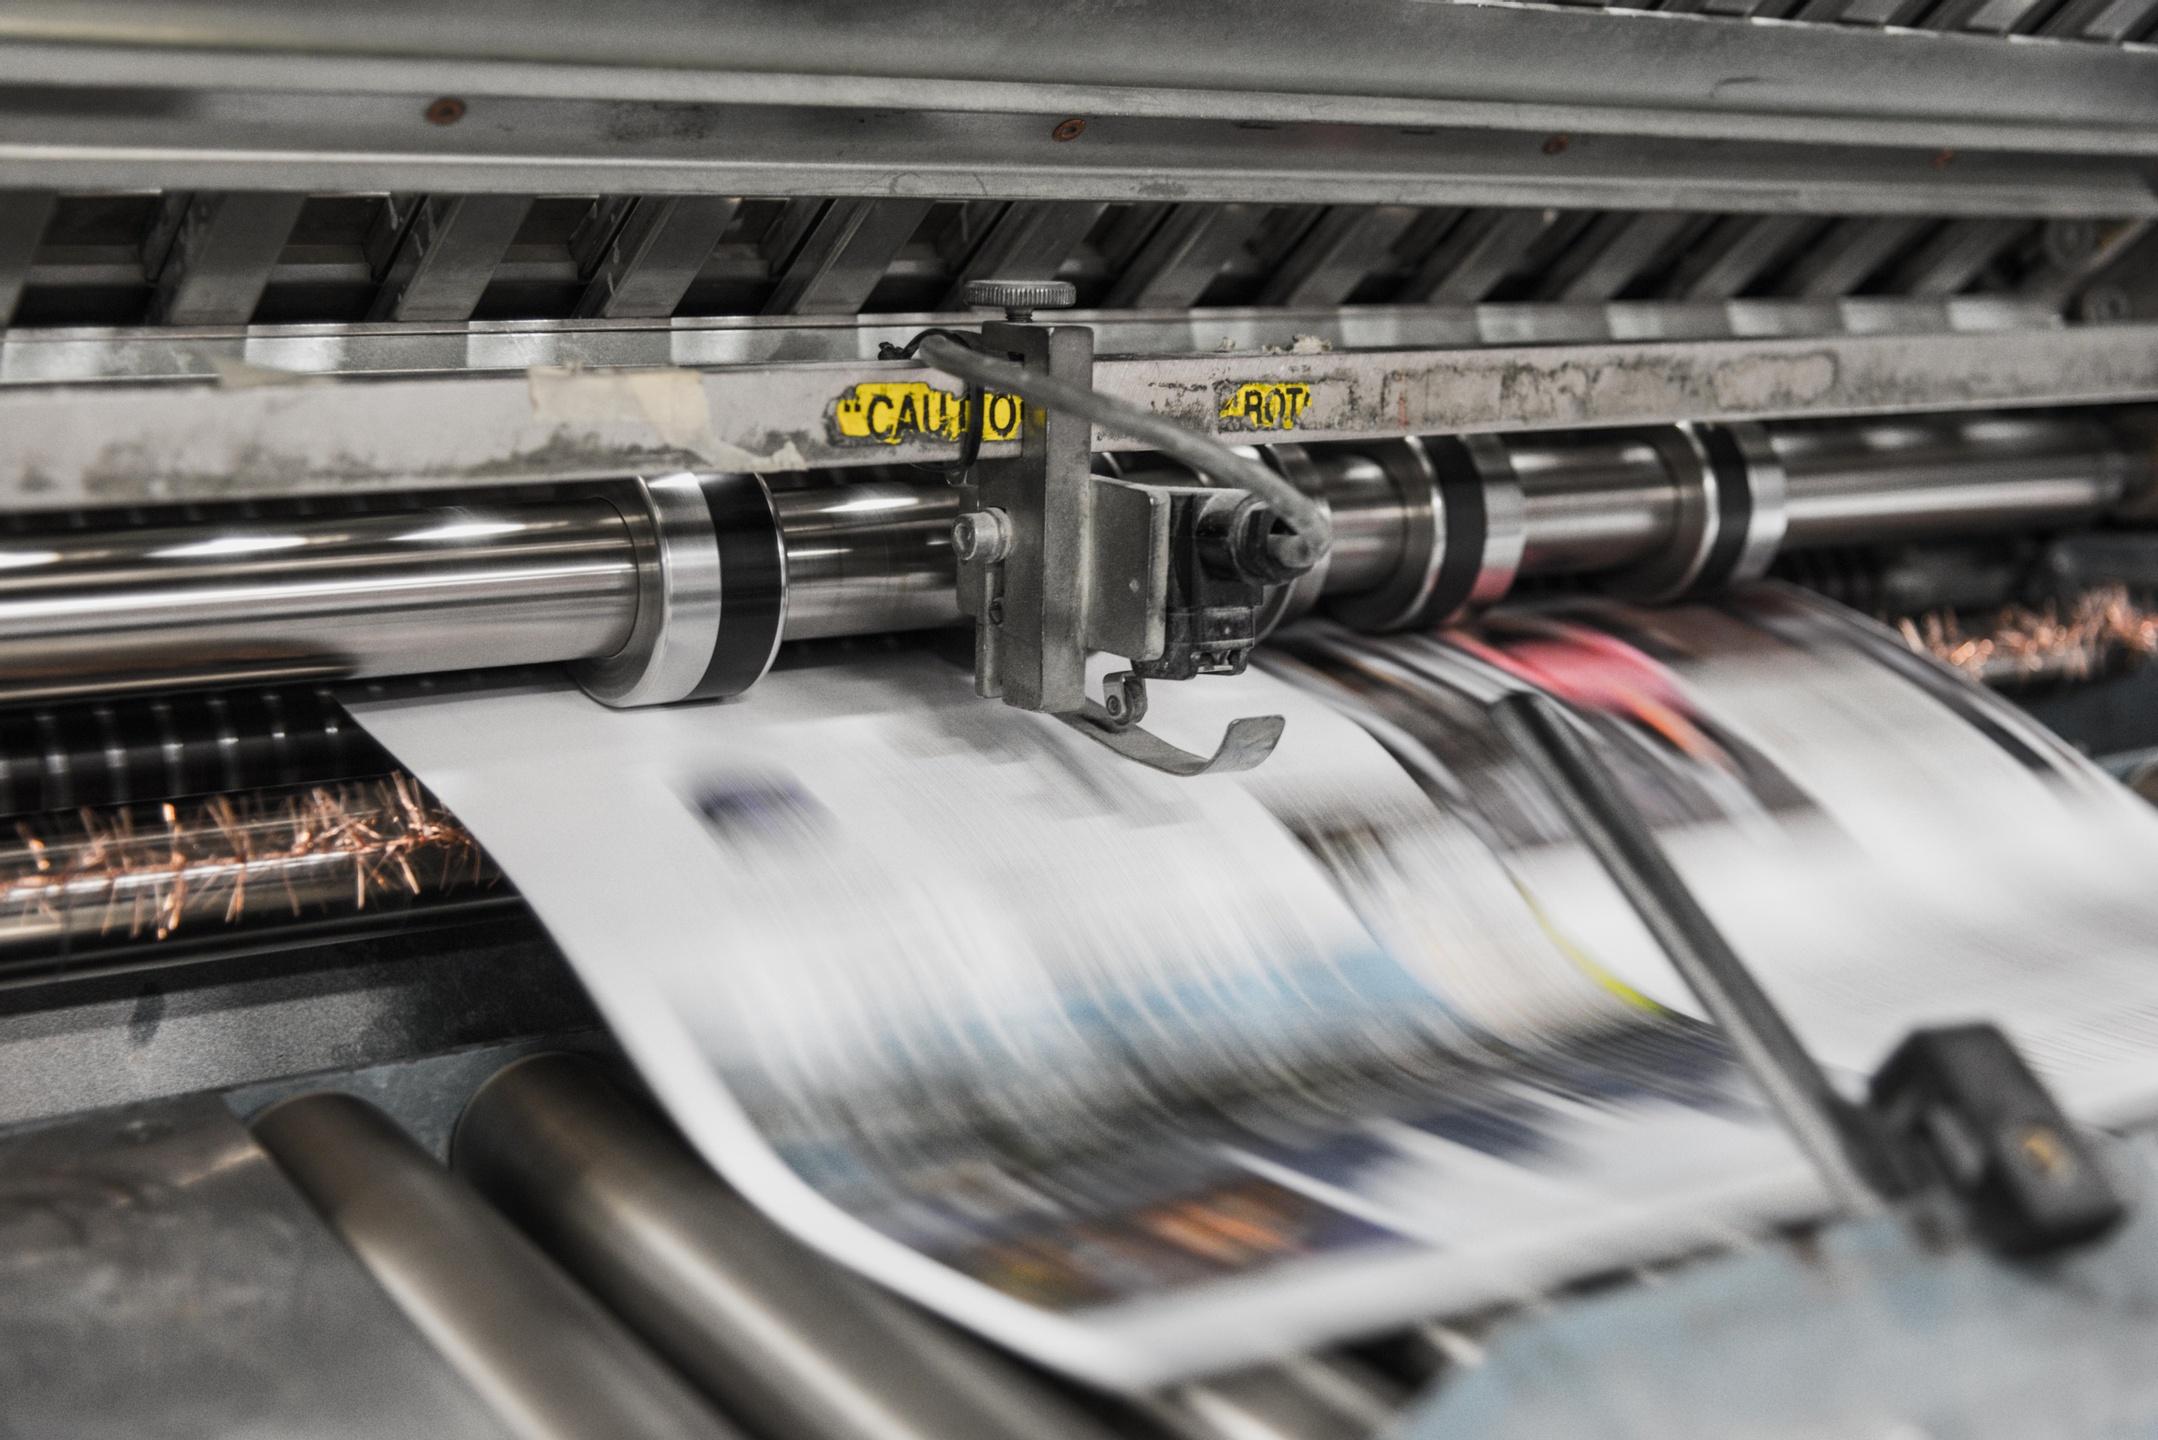 A photo of a printing machine